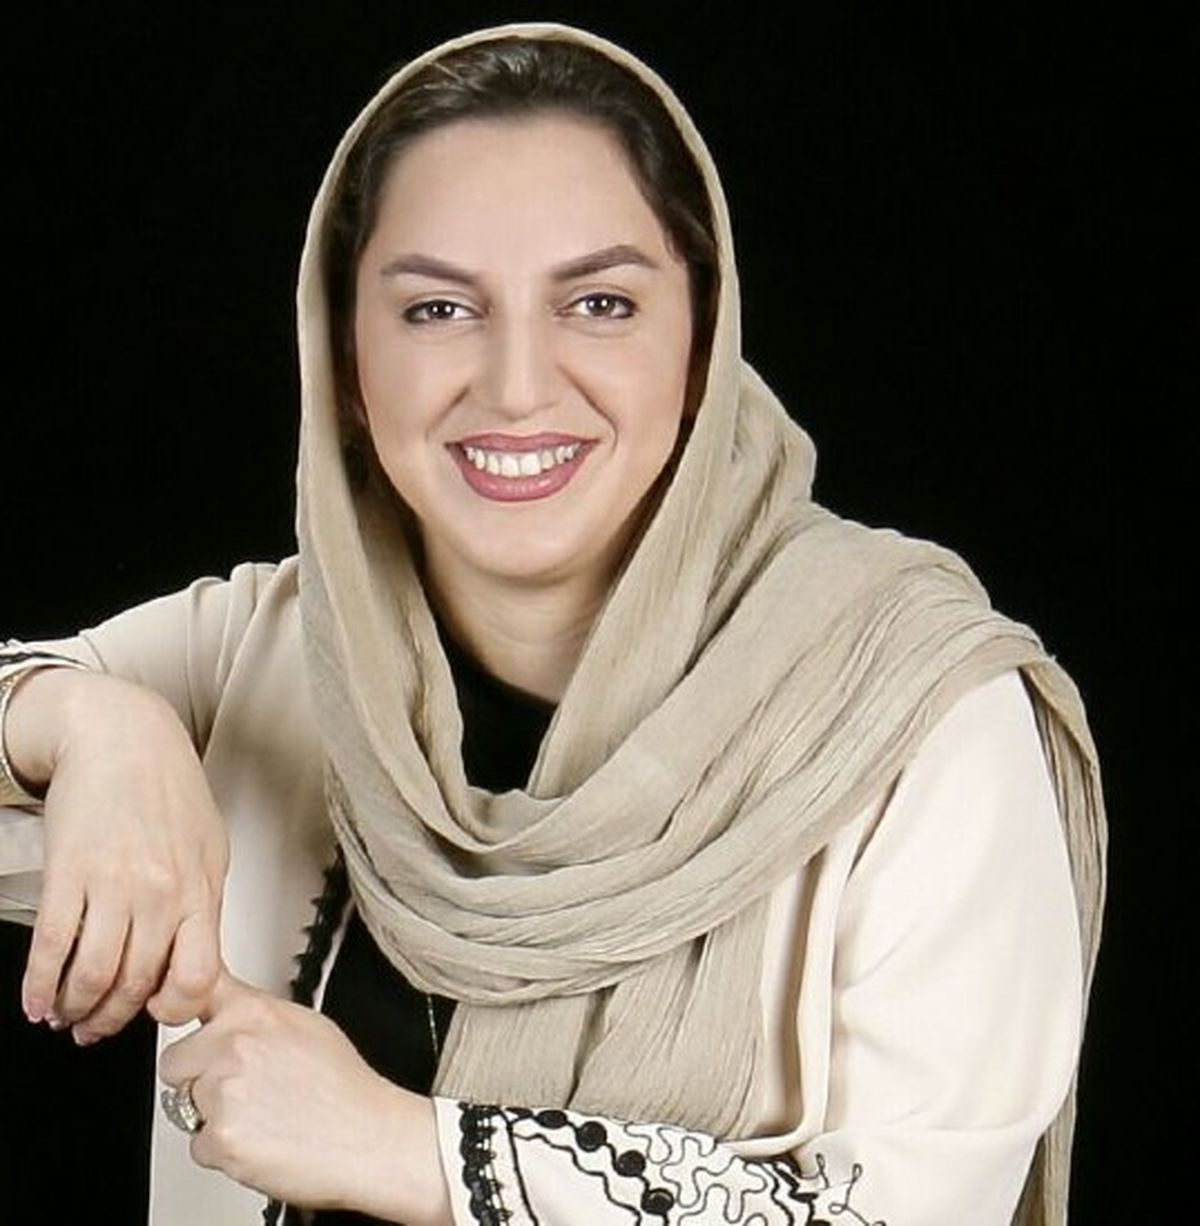 سریال خداحافظ مادر پرویز شیخ طادی